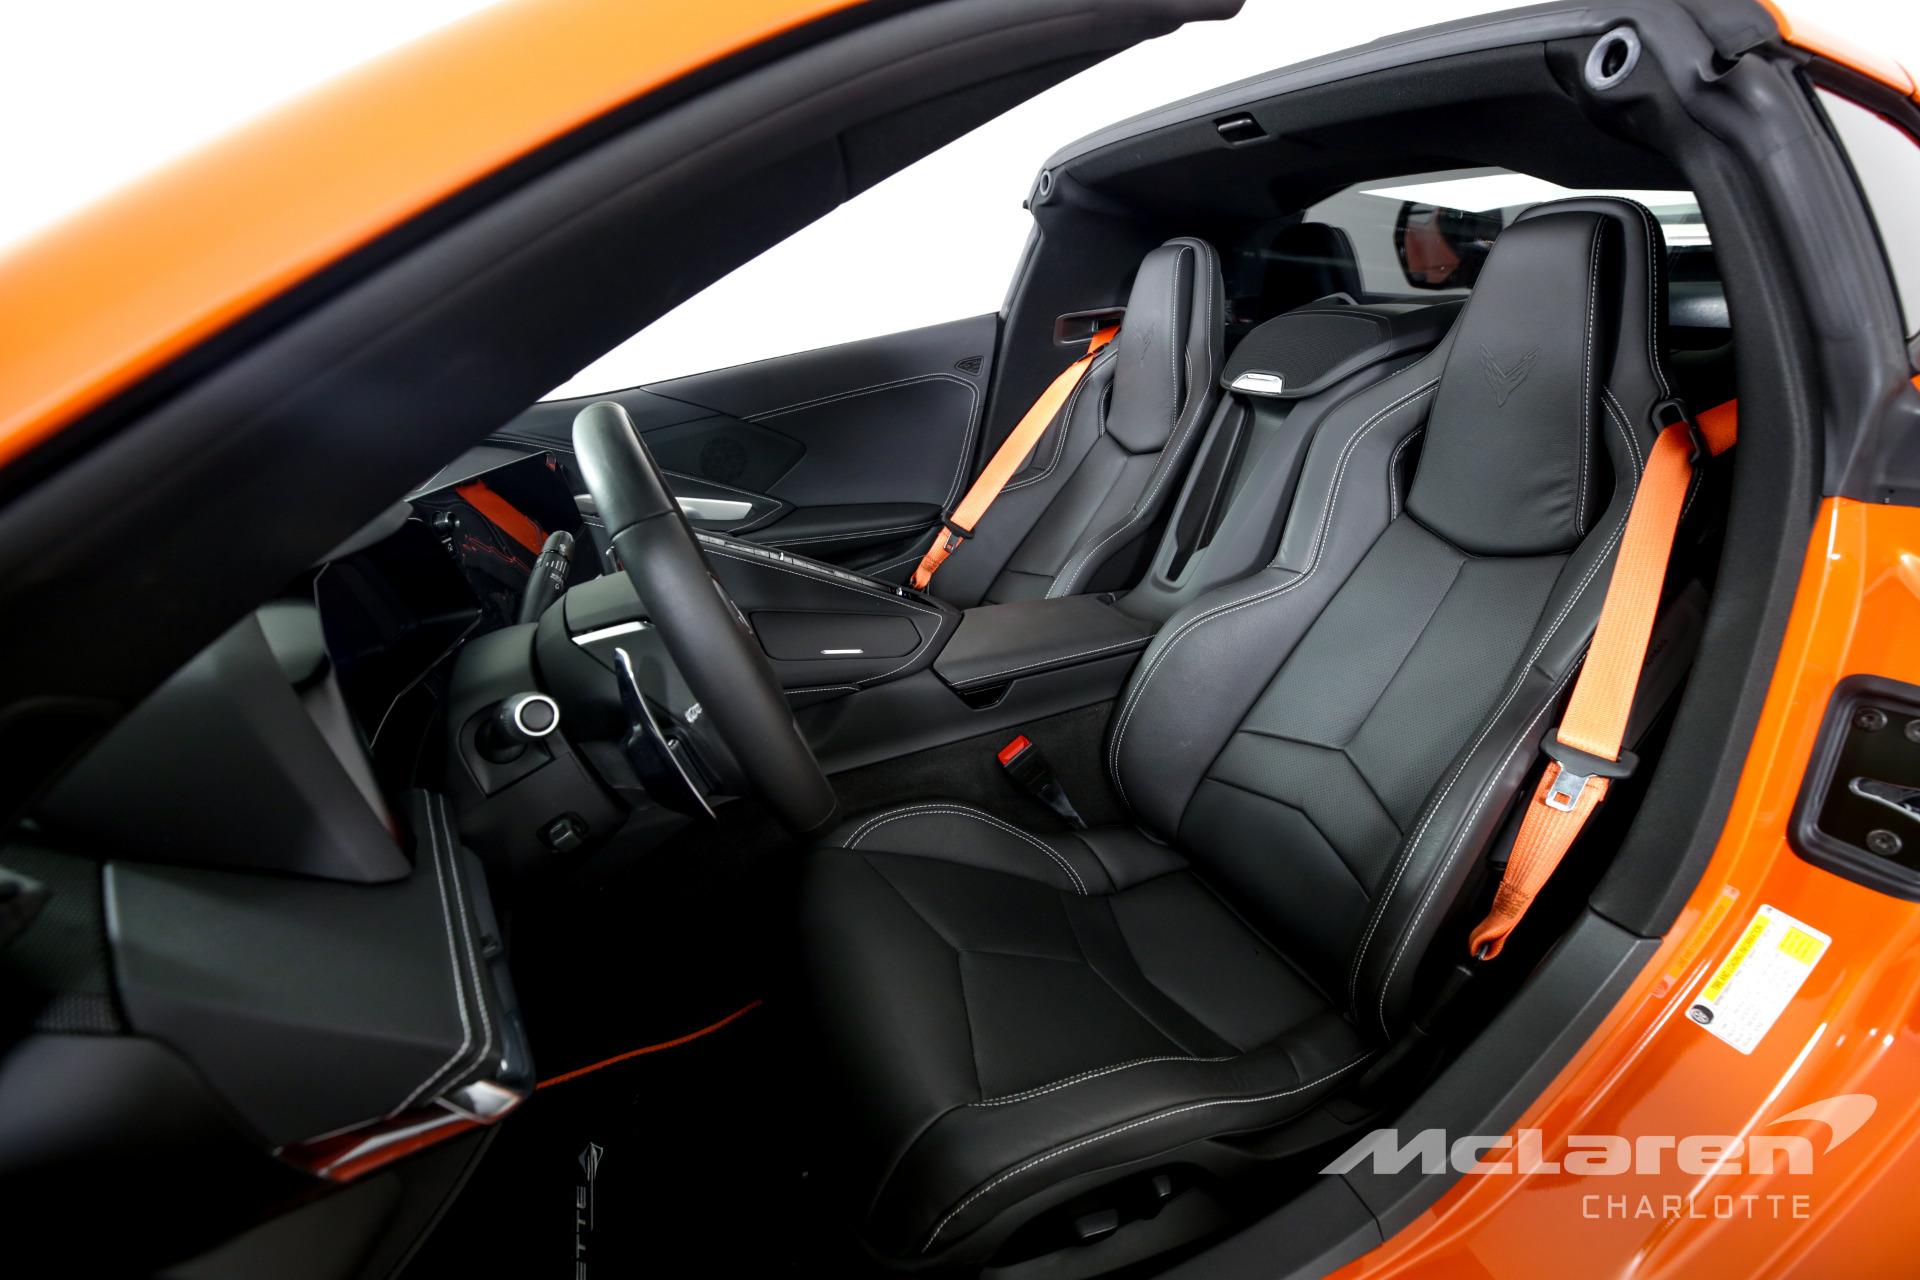 Used 2020 Chevrolet Corvette Stingray | Charlotte, NC